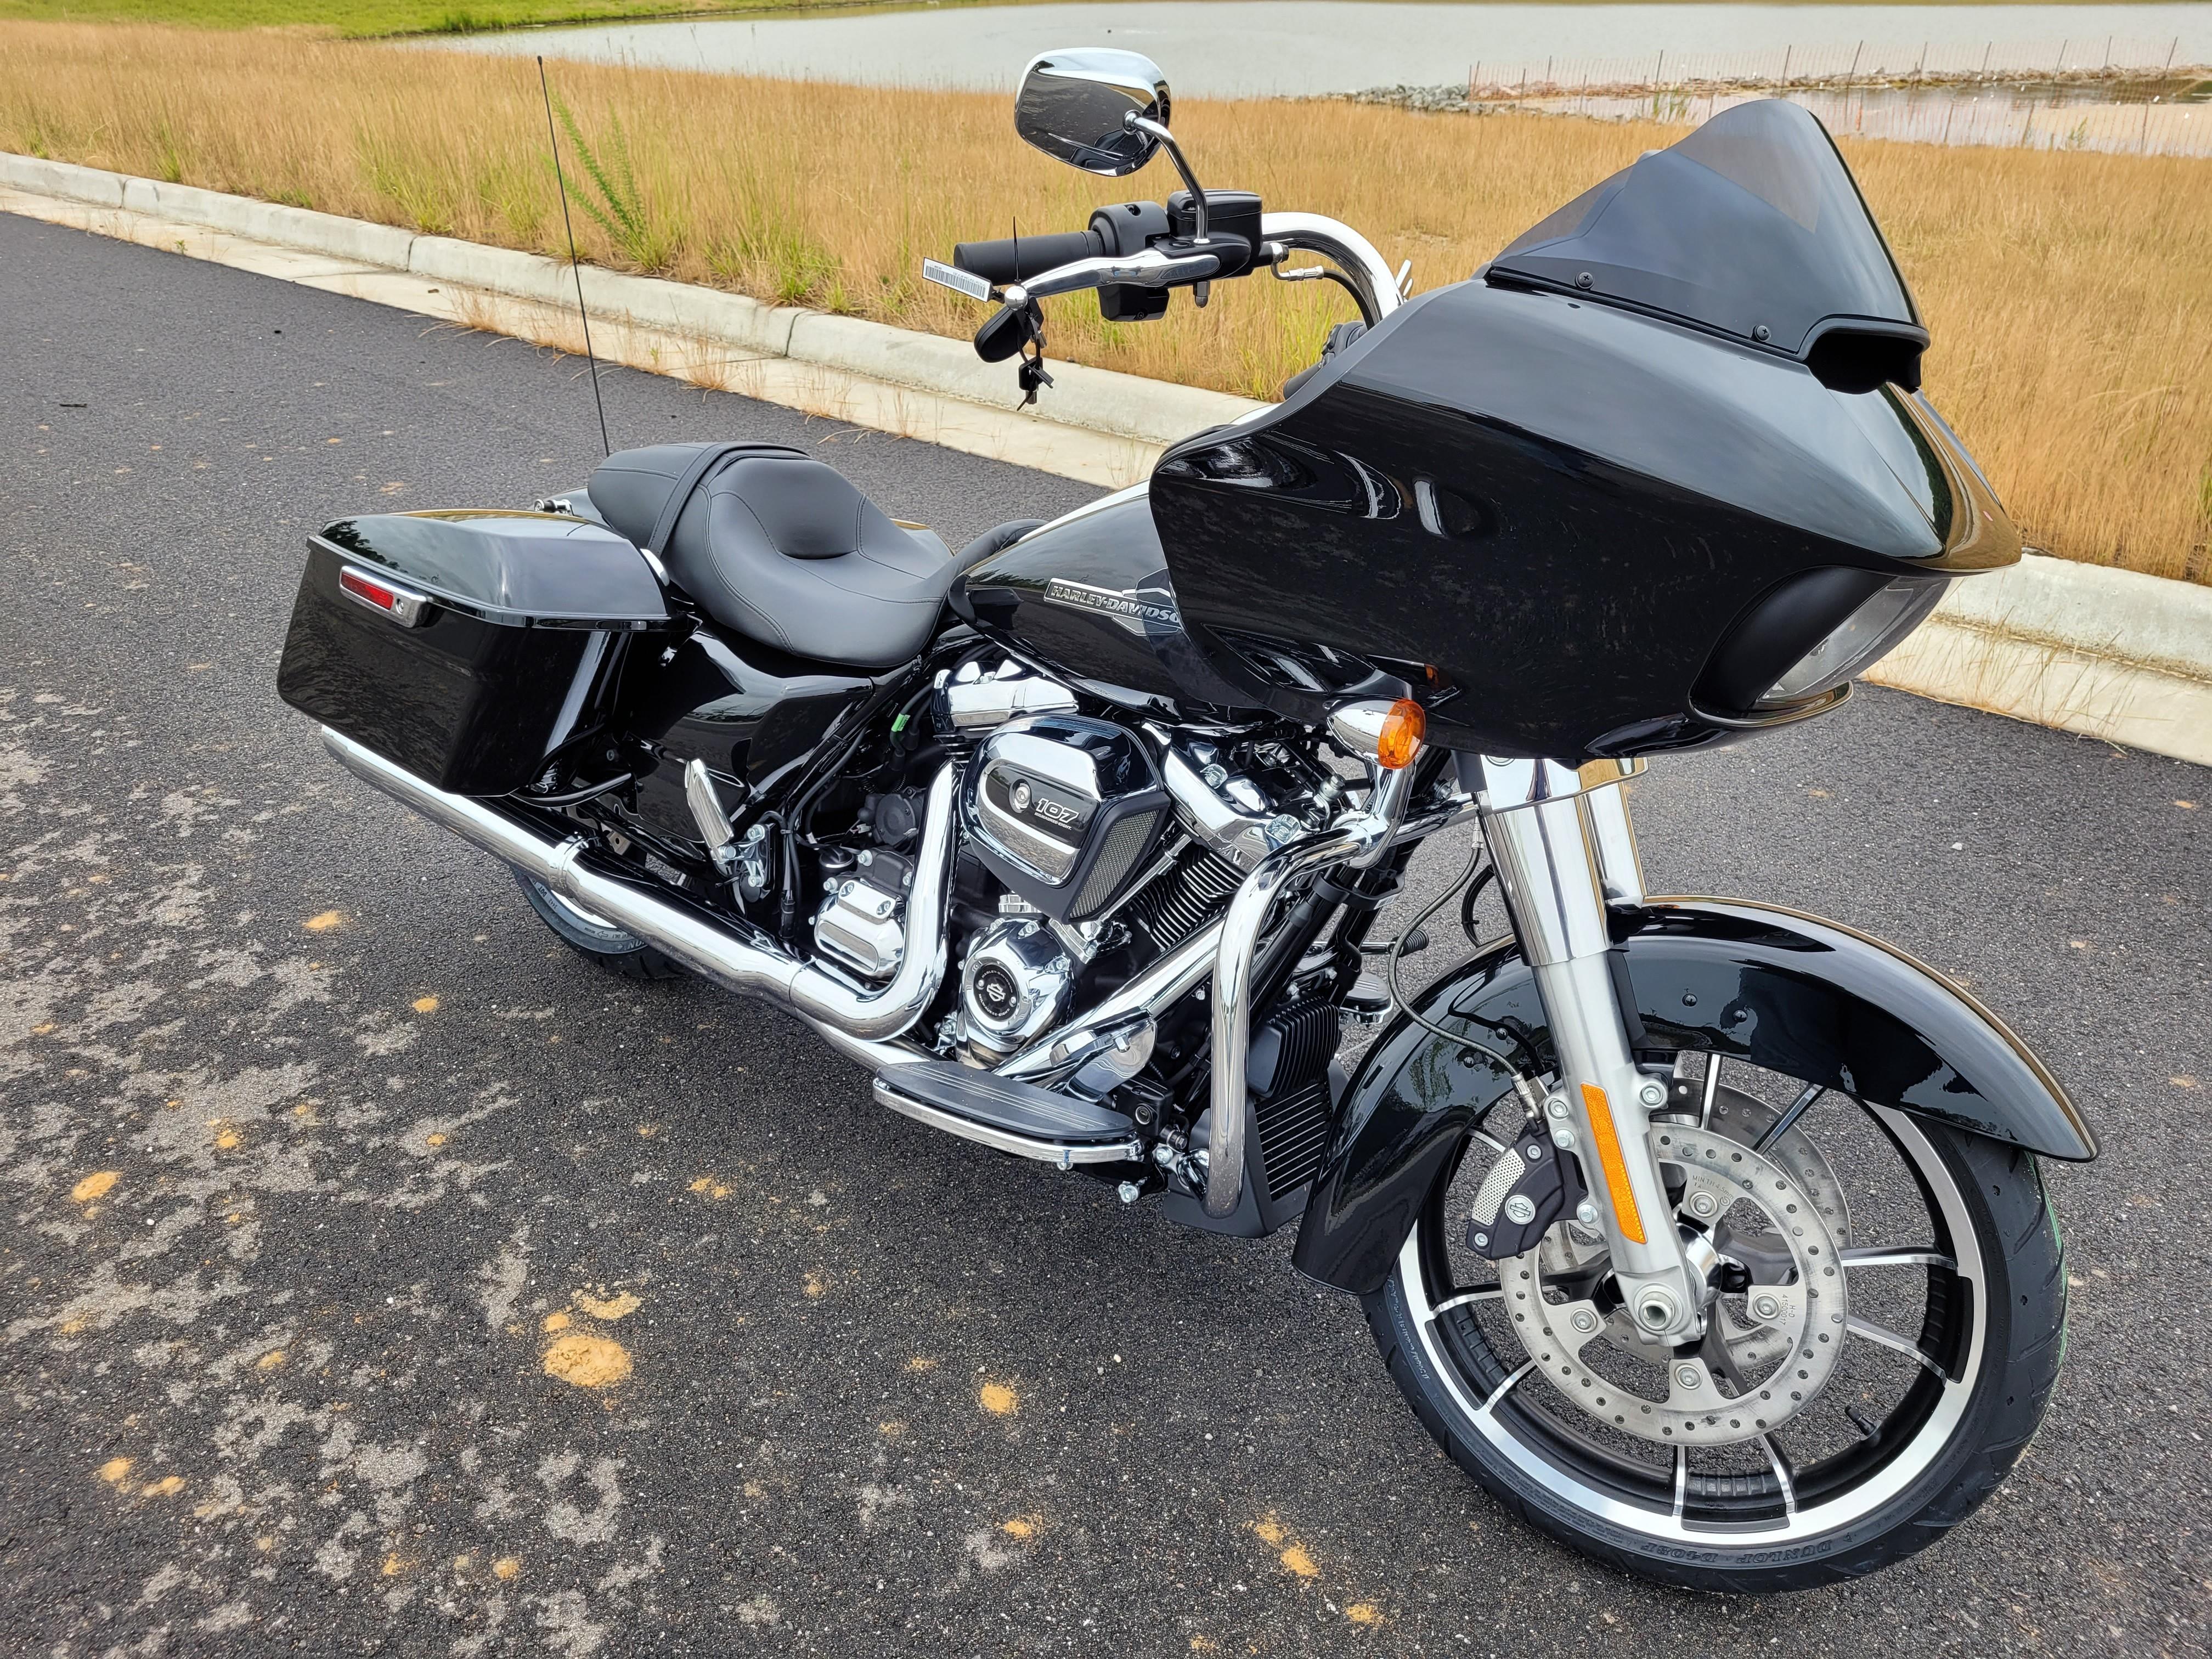 2021 Harley-Davidson Touring Road Glide at Richmond Harley-Davidson